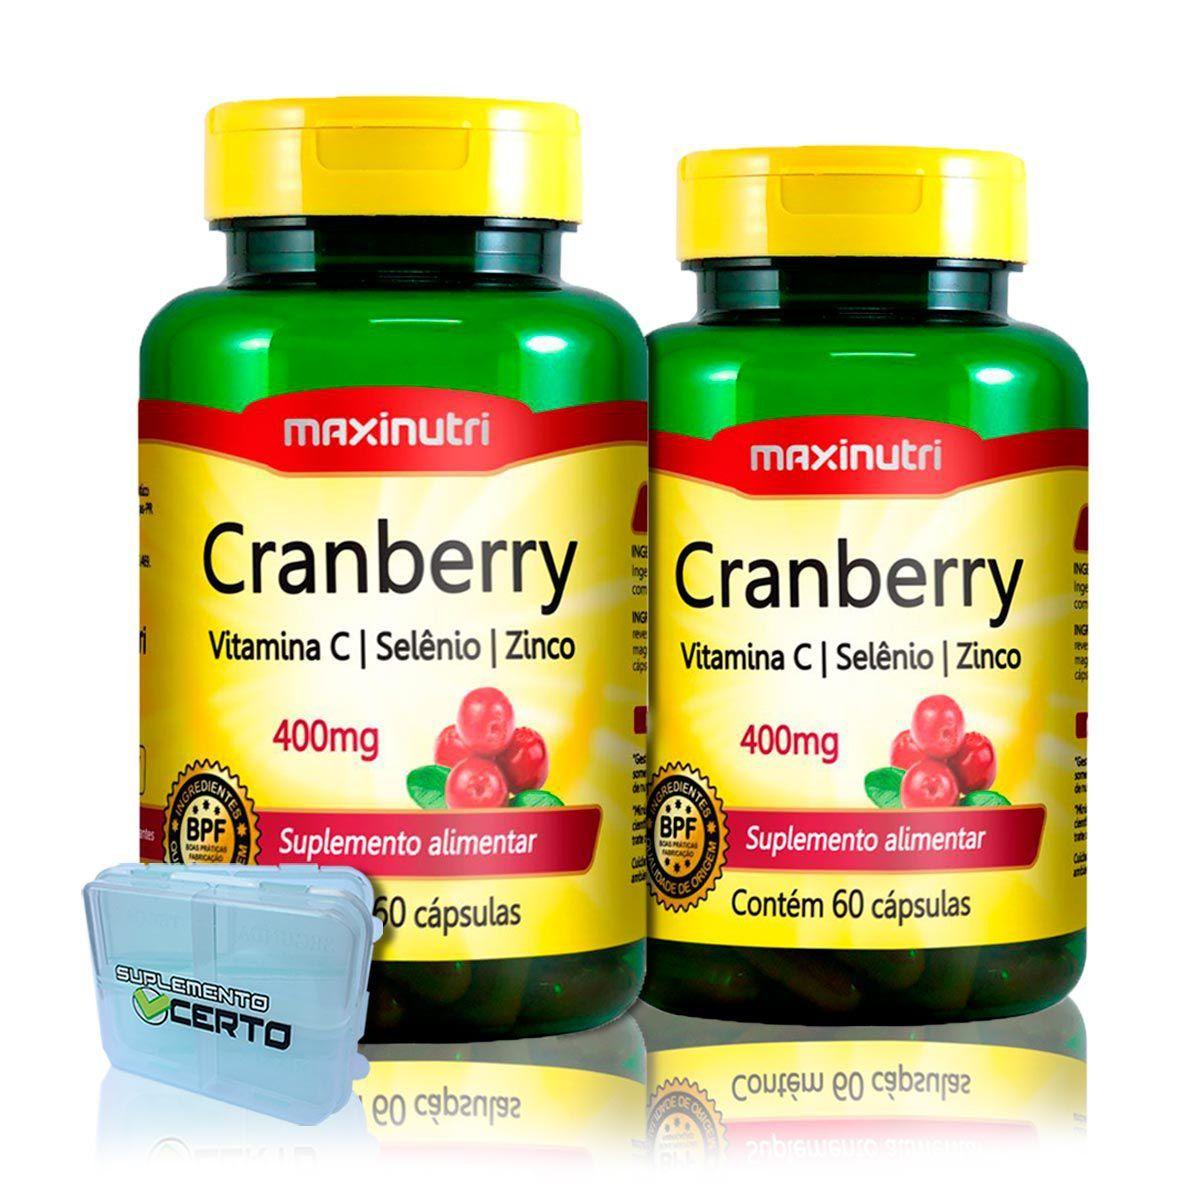 Combo 2x Cranberry Antioxidante com Vitamina C e Zinco + Porta Caps - Maxinutri